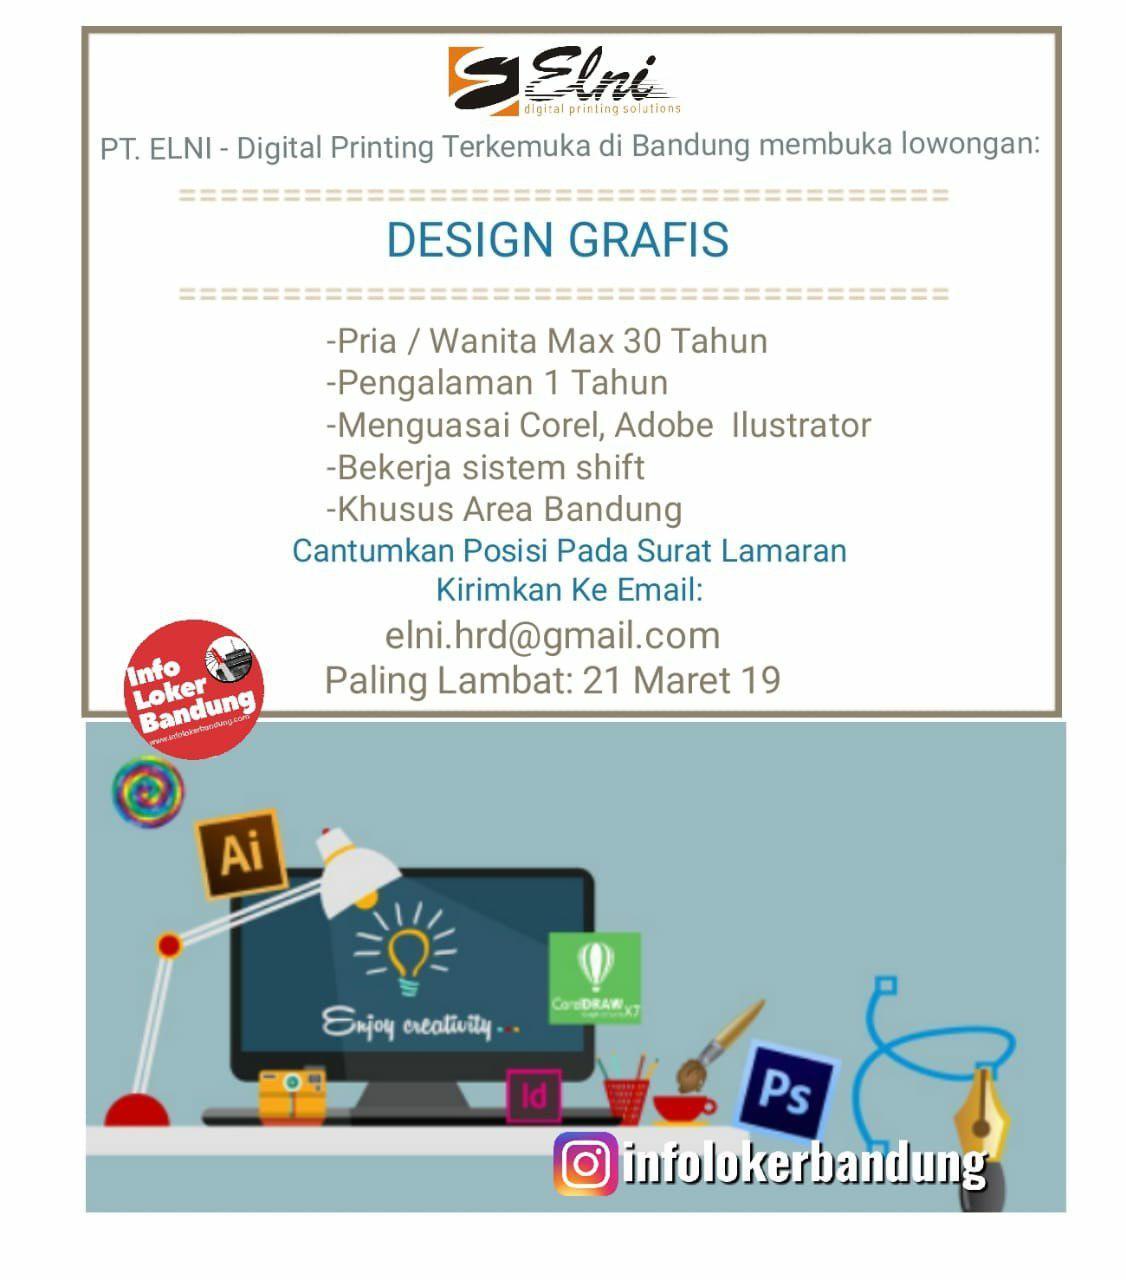 Lowongan Kerja Design Grafis PT.Elni Bandung Maret 2019